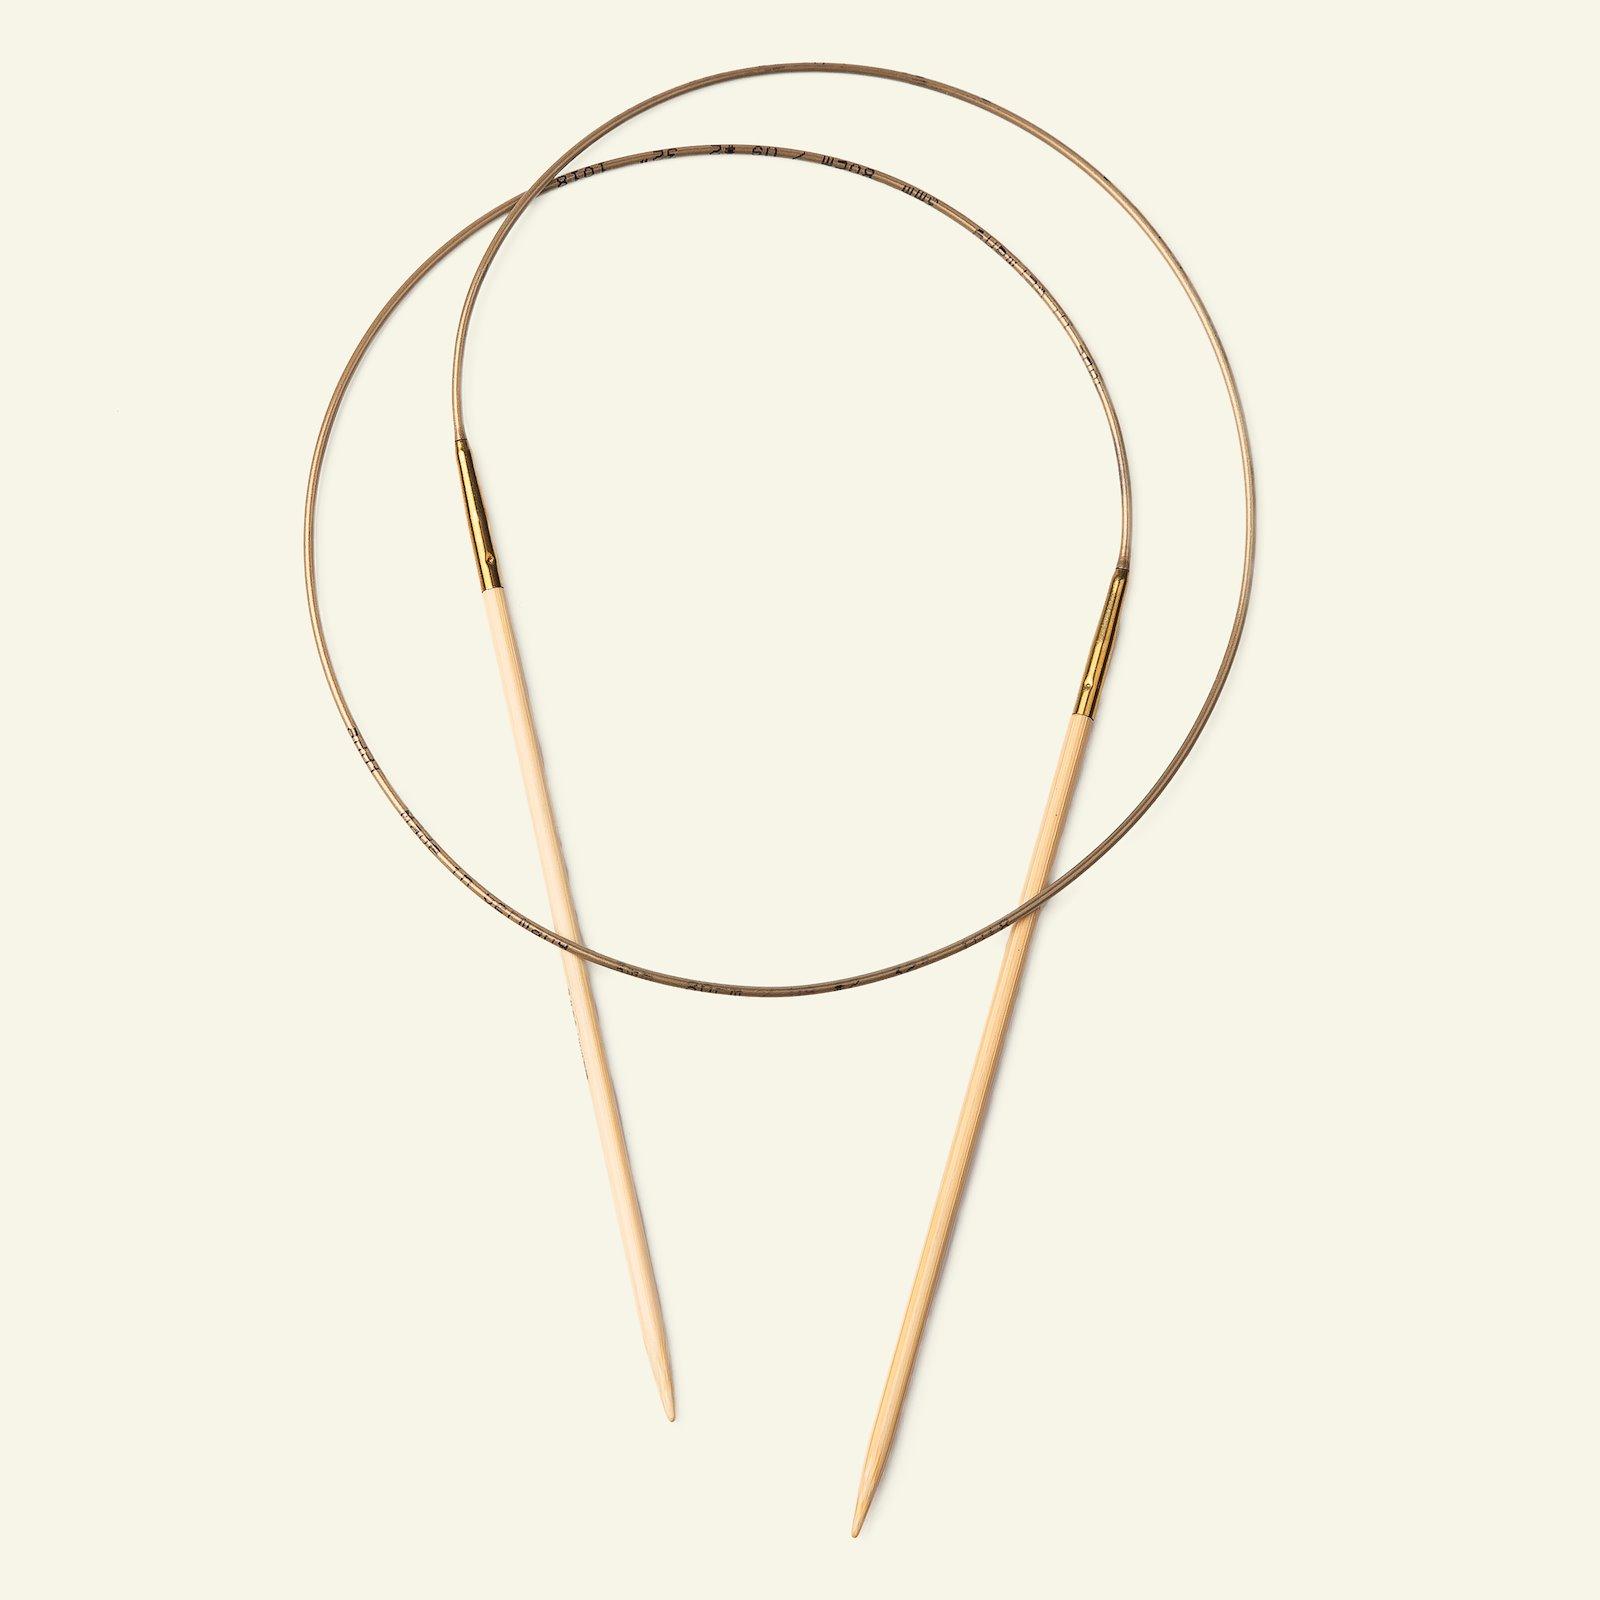 Addi circular needle bamboo 80cm 6mm 83128_pack